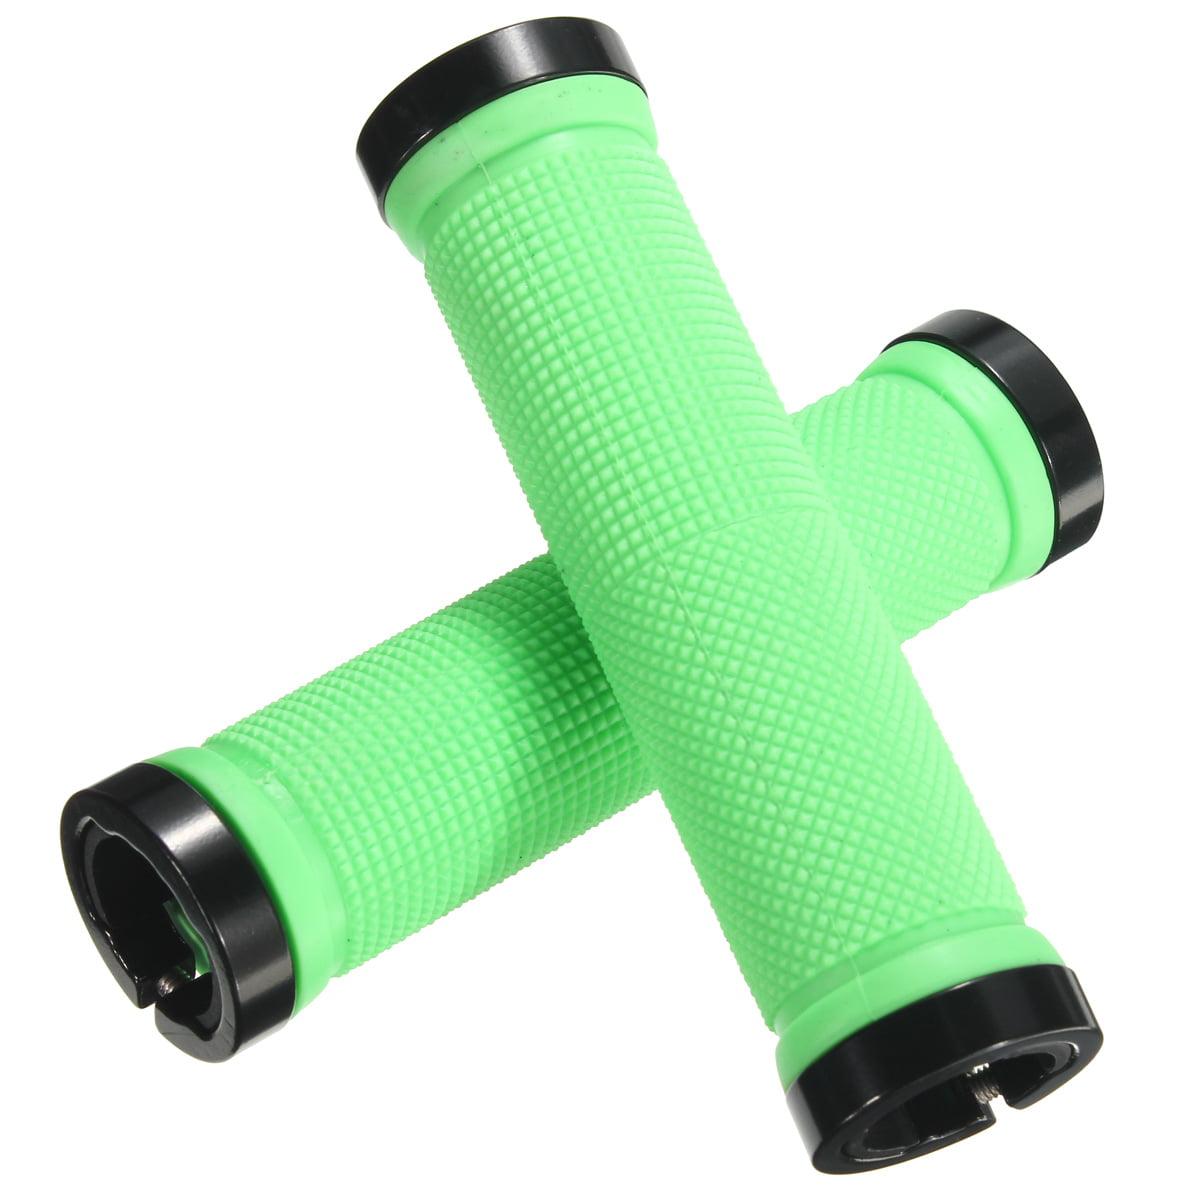 Rubber + Aluminnum Alloy Lock-on Nonslip Bike Bicycle MTB Cycling Handle Bar Set Grip 10 Colors